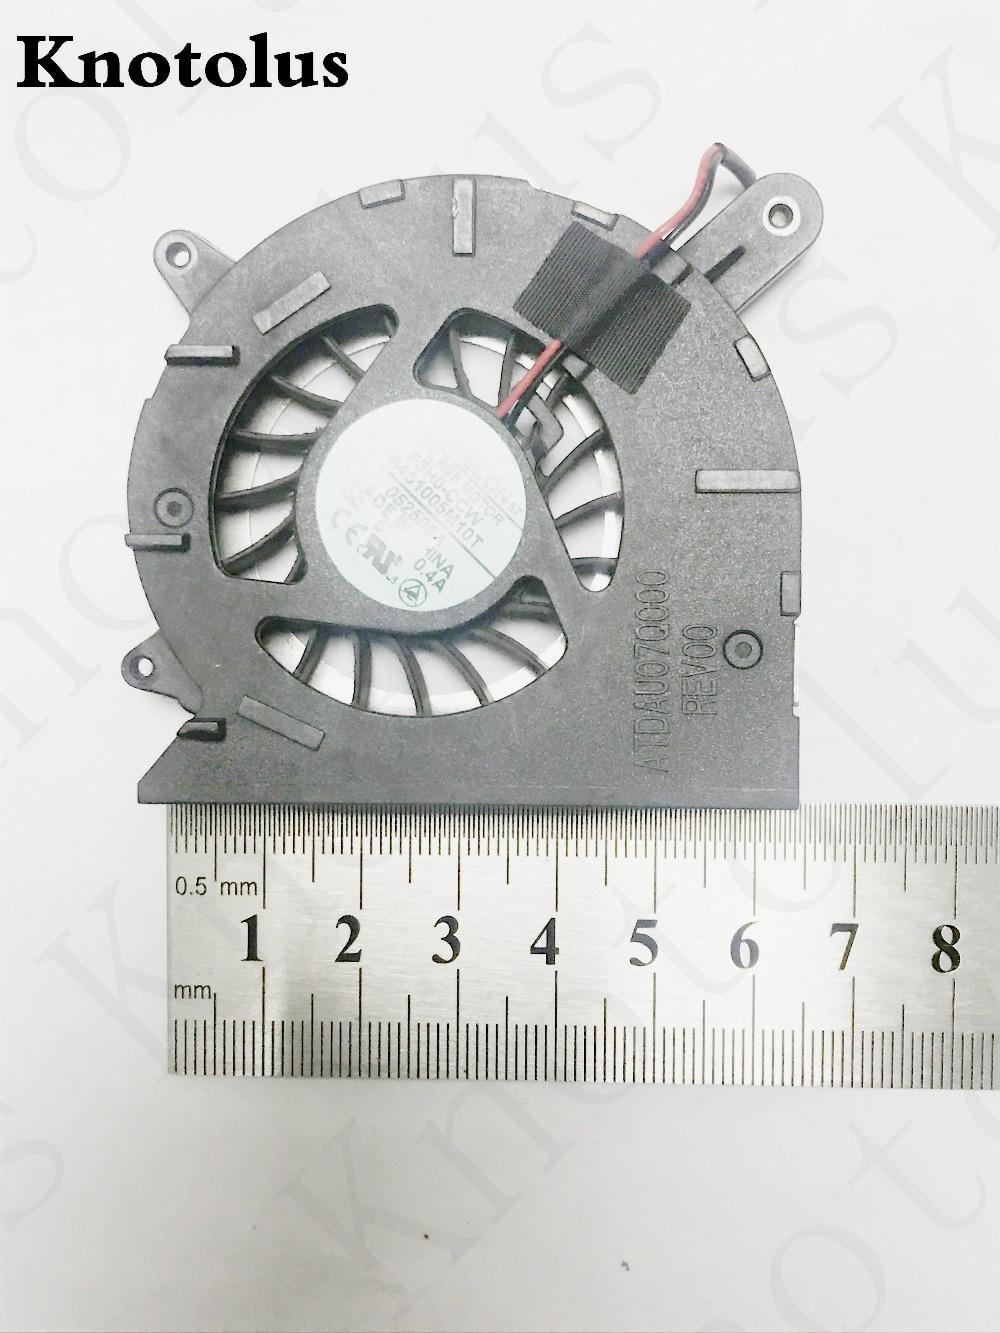 Охлаждающий вентилятор для ноутбука HP nc4200 nc4400 tc400 tc4400, вентилятор sps 383528-001, бесплатная доставка, 100% тестирование